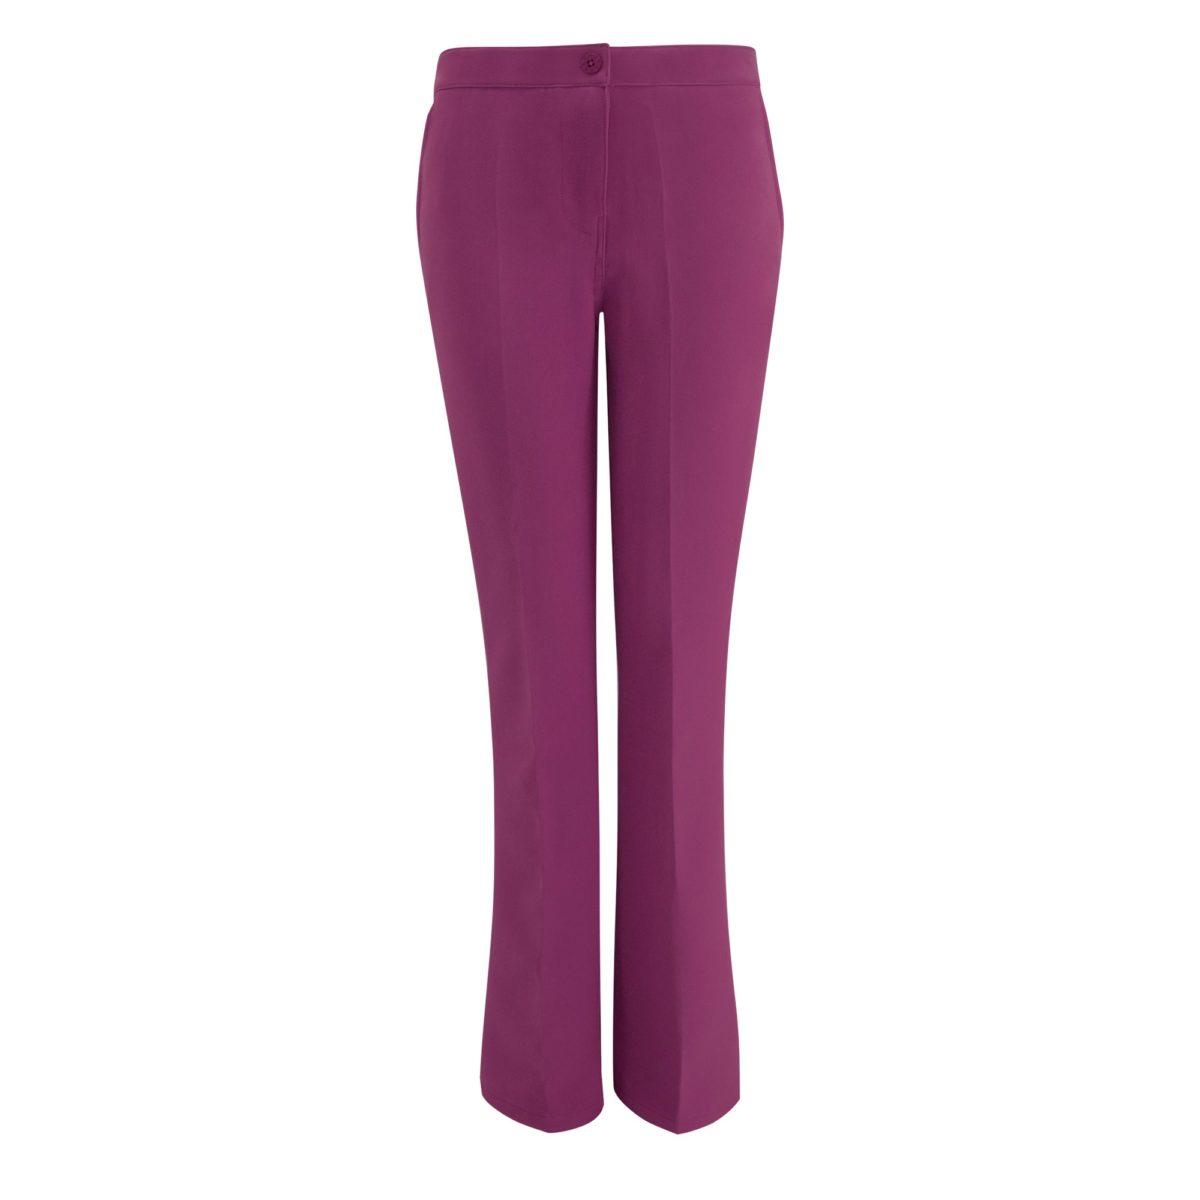 Pantalone Bootcut Viola - vista frontale | Nicla